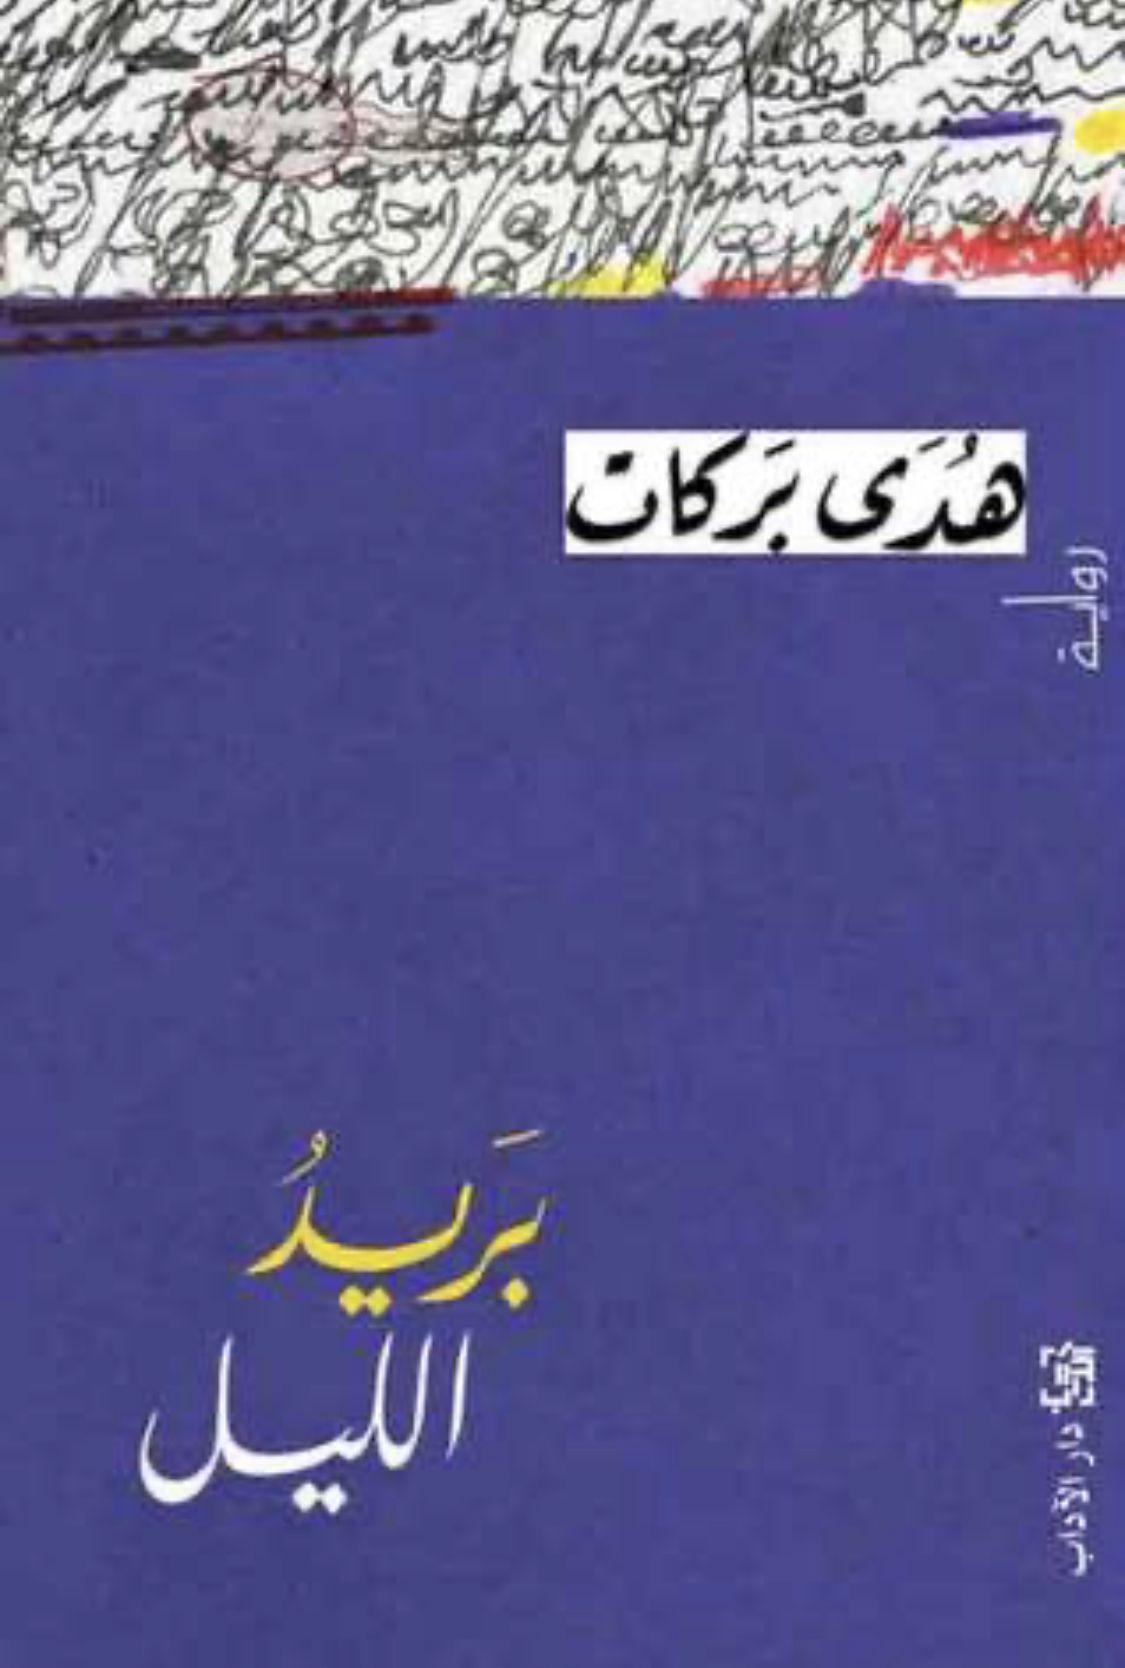 Pin By Yassmin Elkhouli On My Book Shelf Arabic Books Book Names My Books